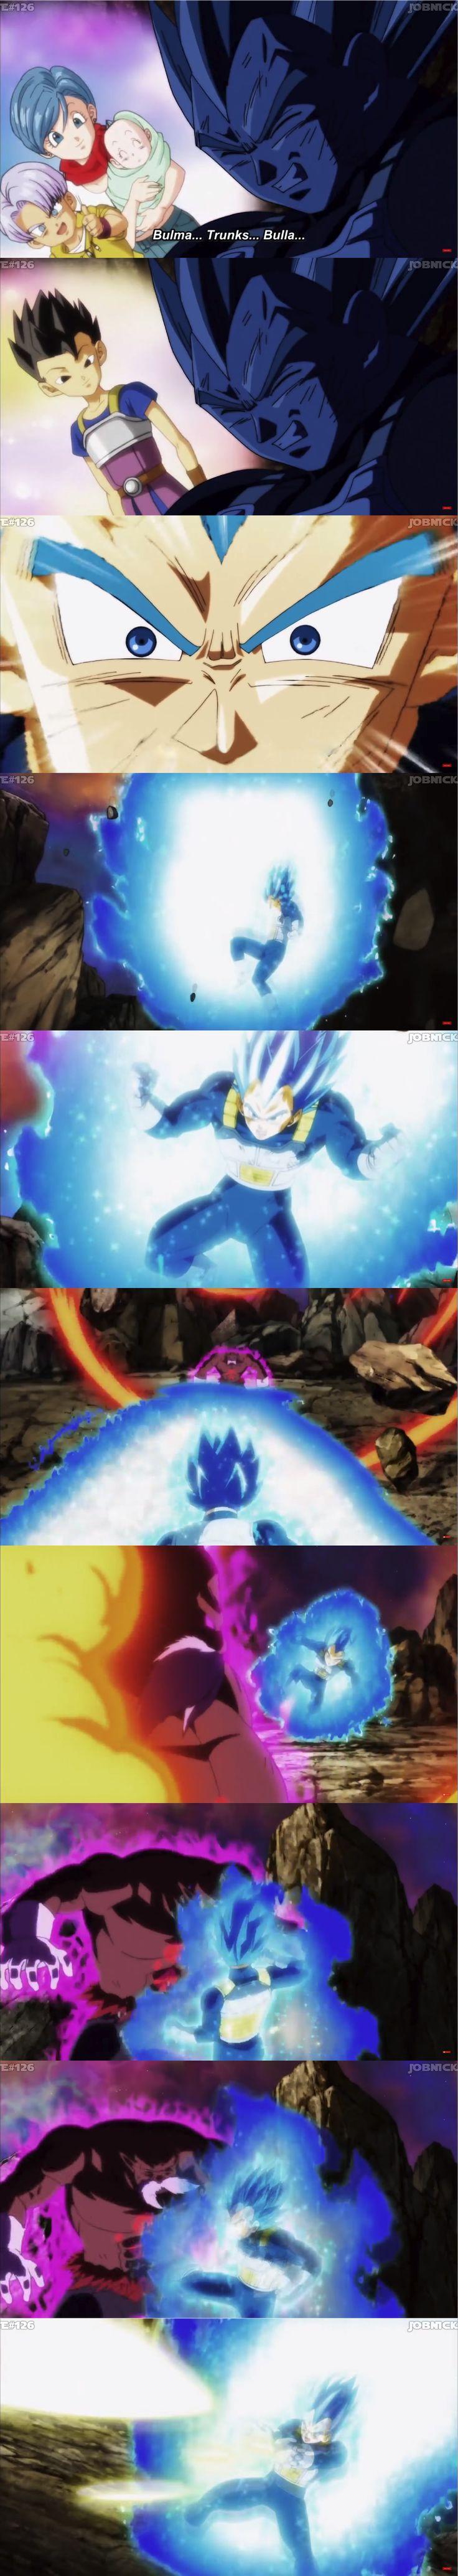 Dragon Ball Super 126 (Vegito)